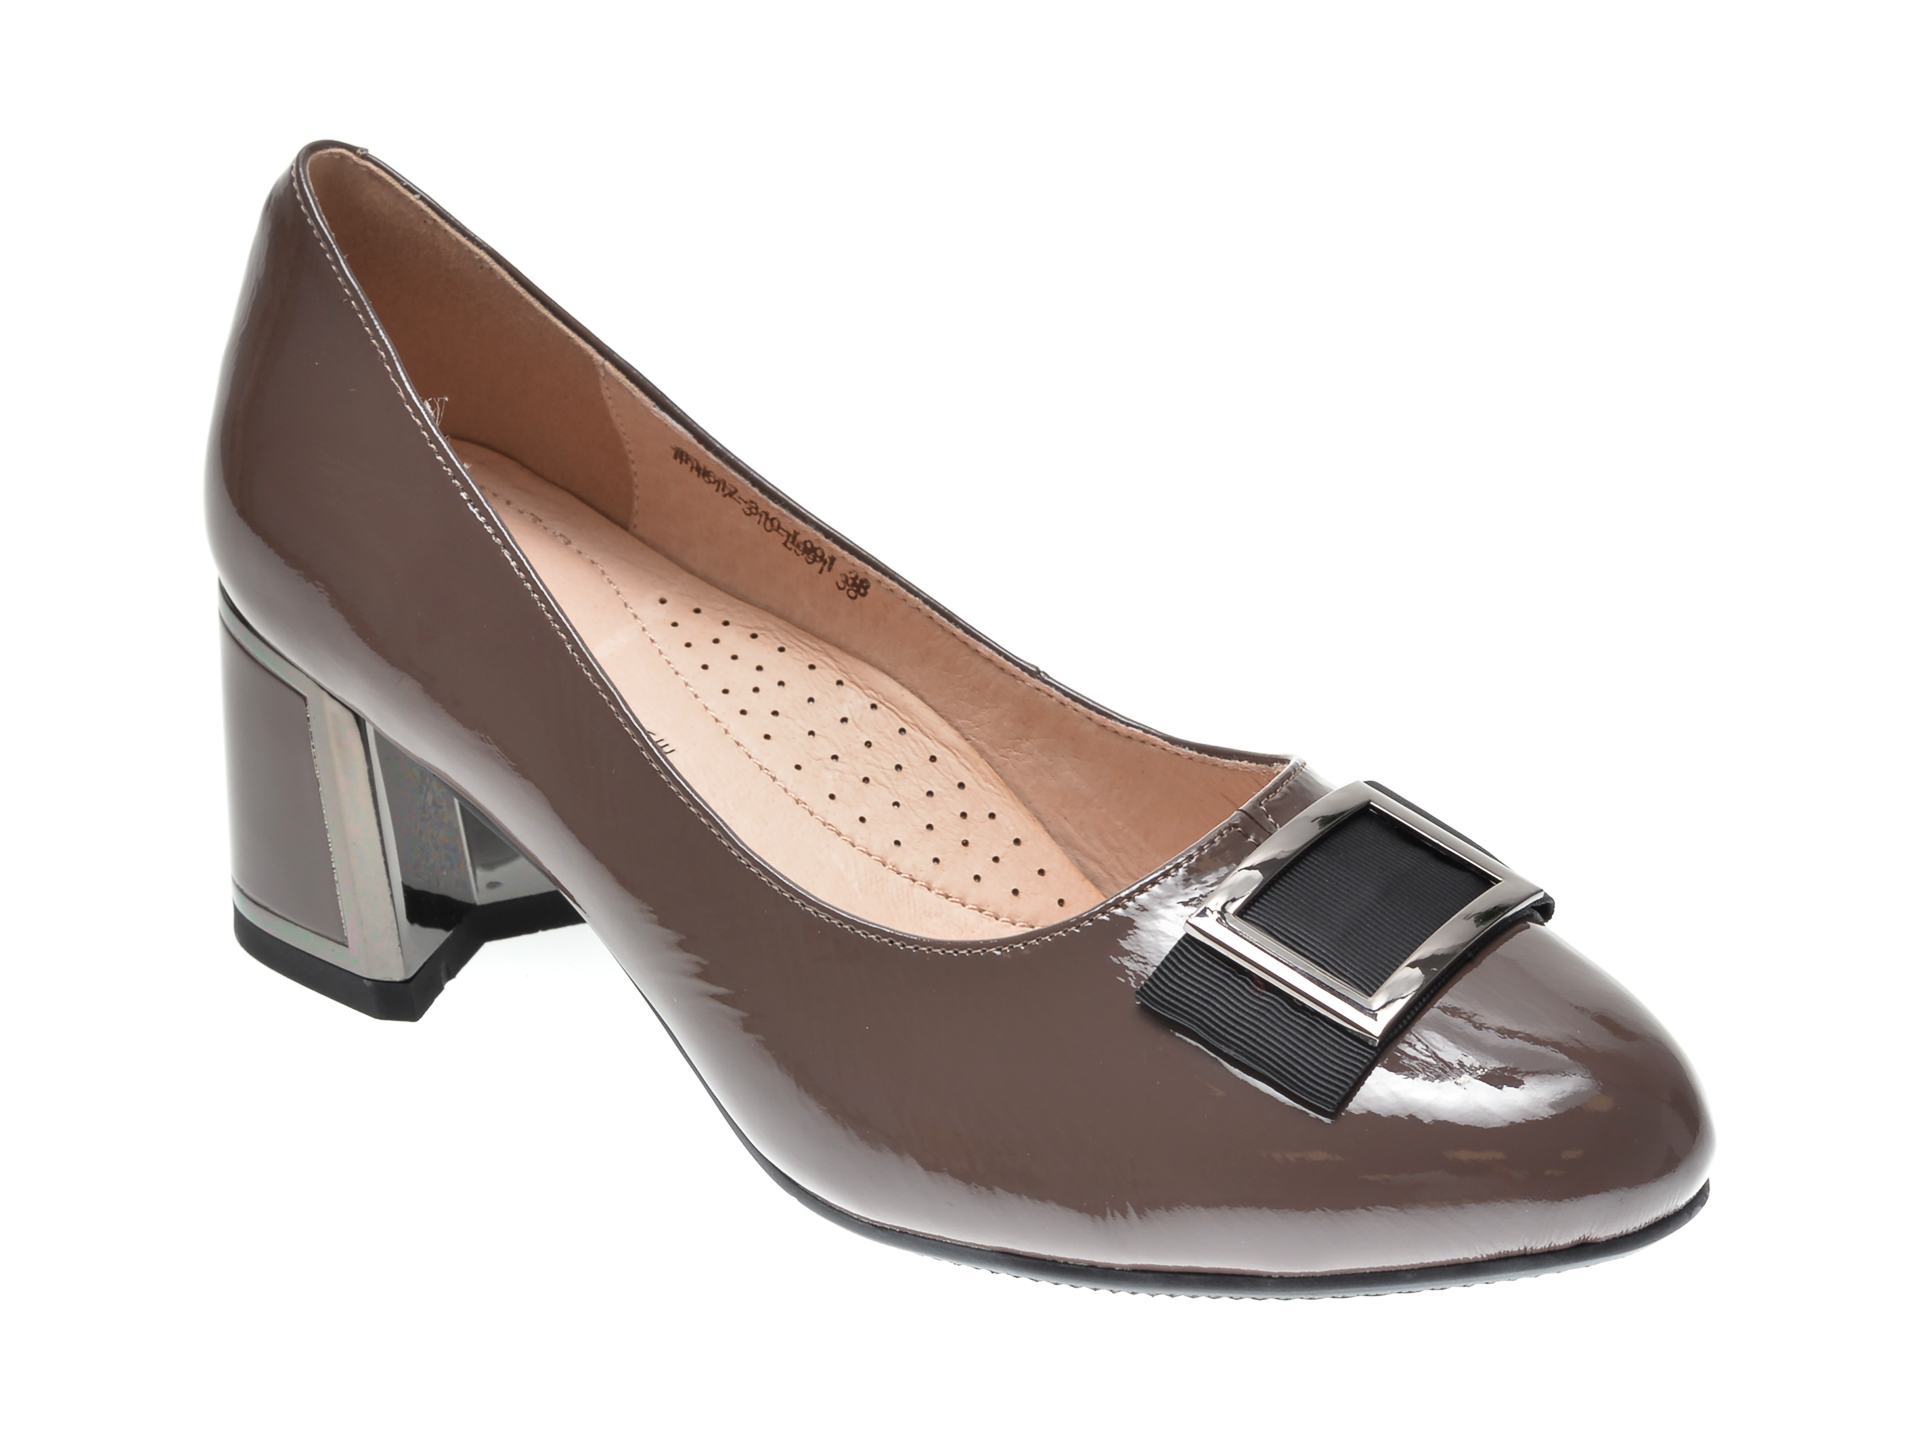 Pantofi KARISMA gri, 1FH6310, din piele naturala lacuita